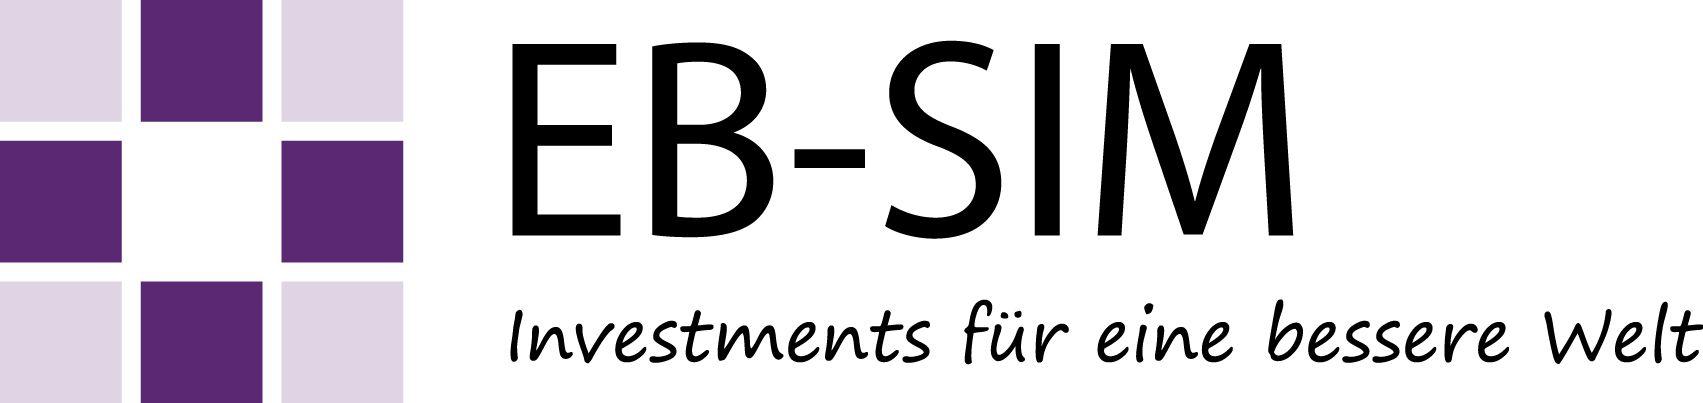 EB - Sustainable Investment Management GmbH